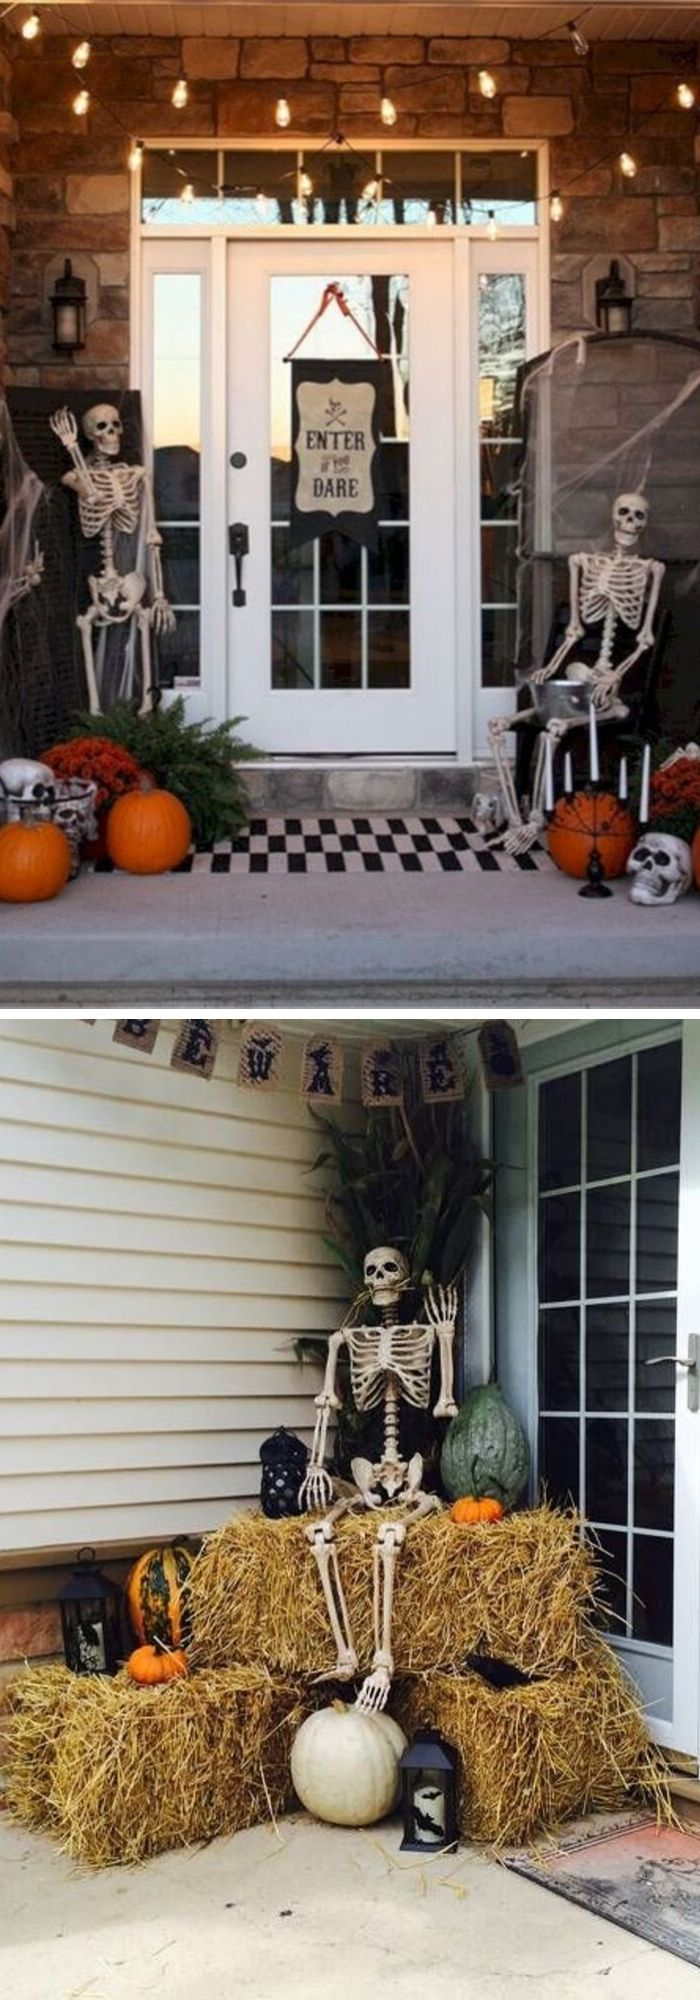 20+ Creative Farmhouse Halloween Decor Ideas & Designs For 20 ...